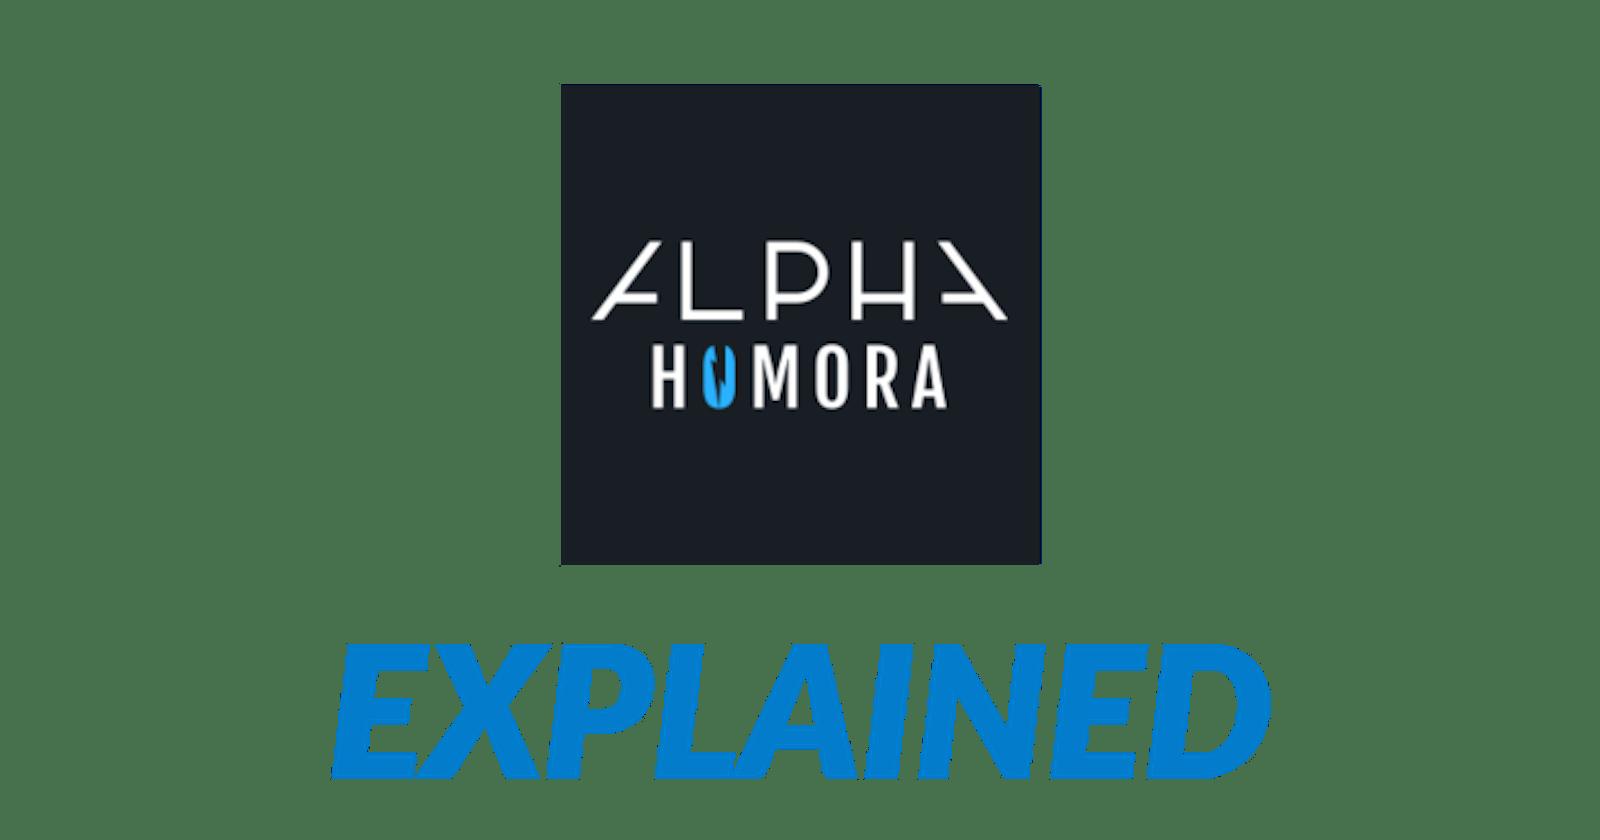 Leveraged Yield Farming on Alpha Homora Explained